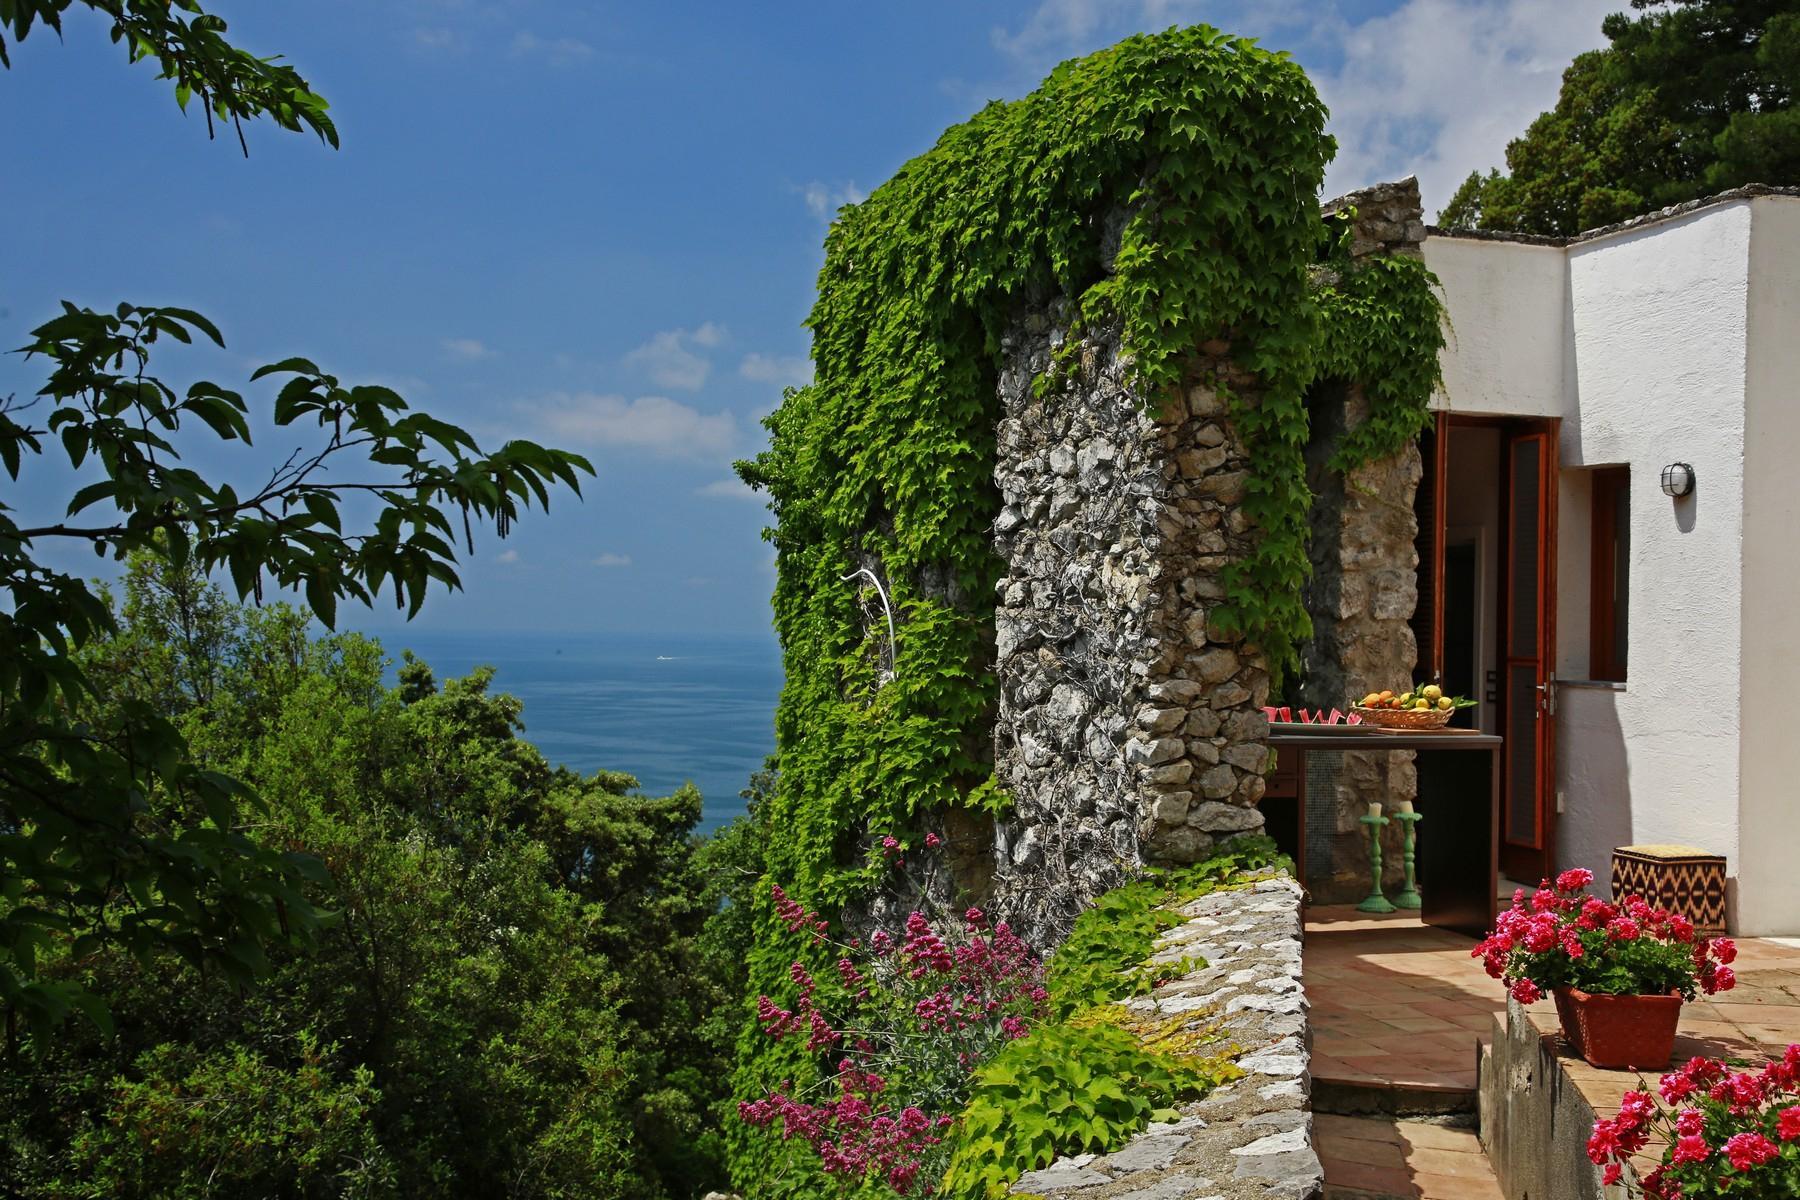 Villa pied dans l'eau in Costiera Amalfitana - 22